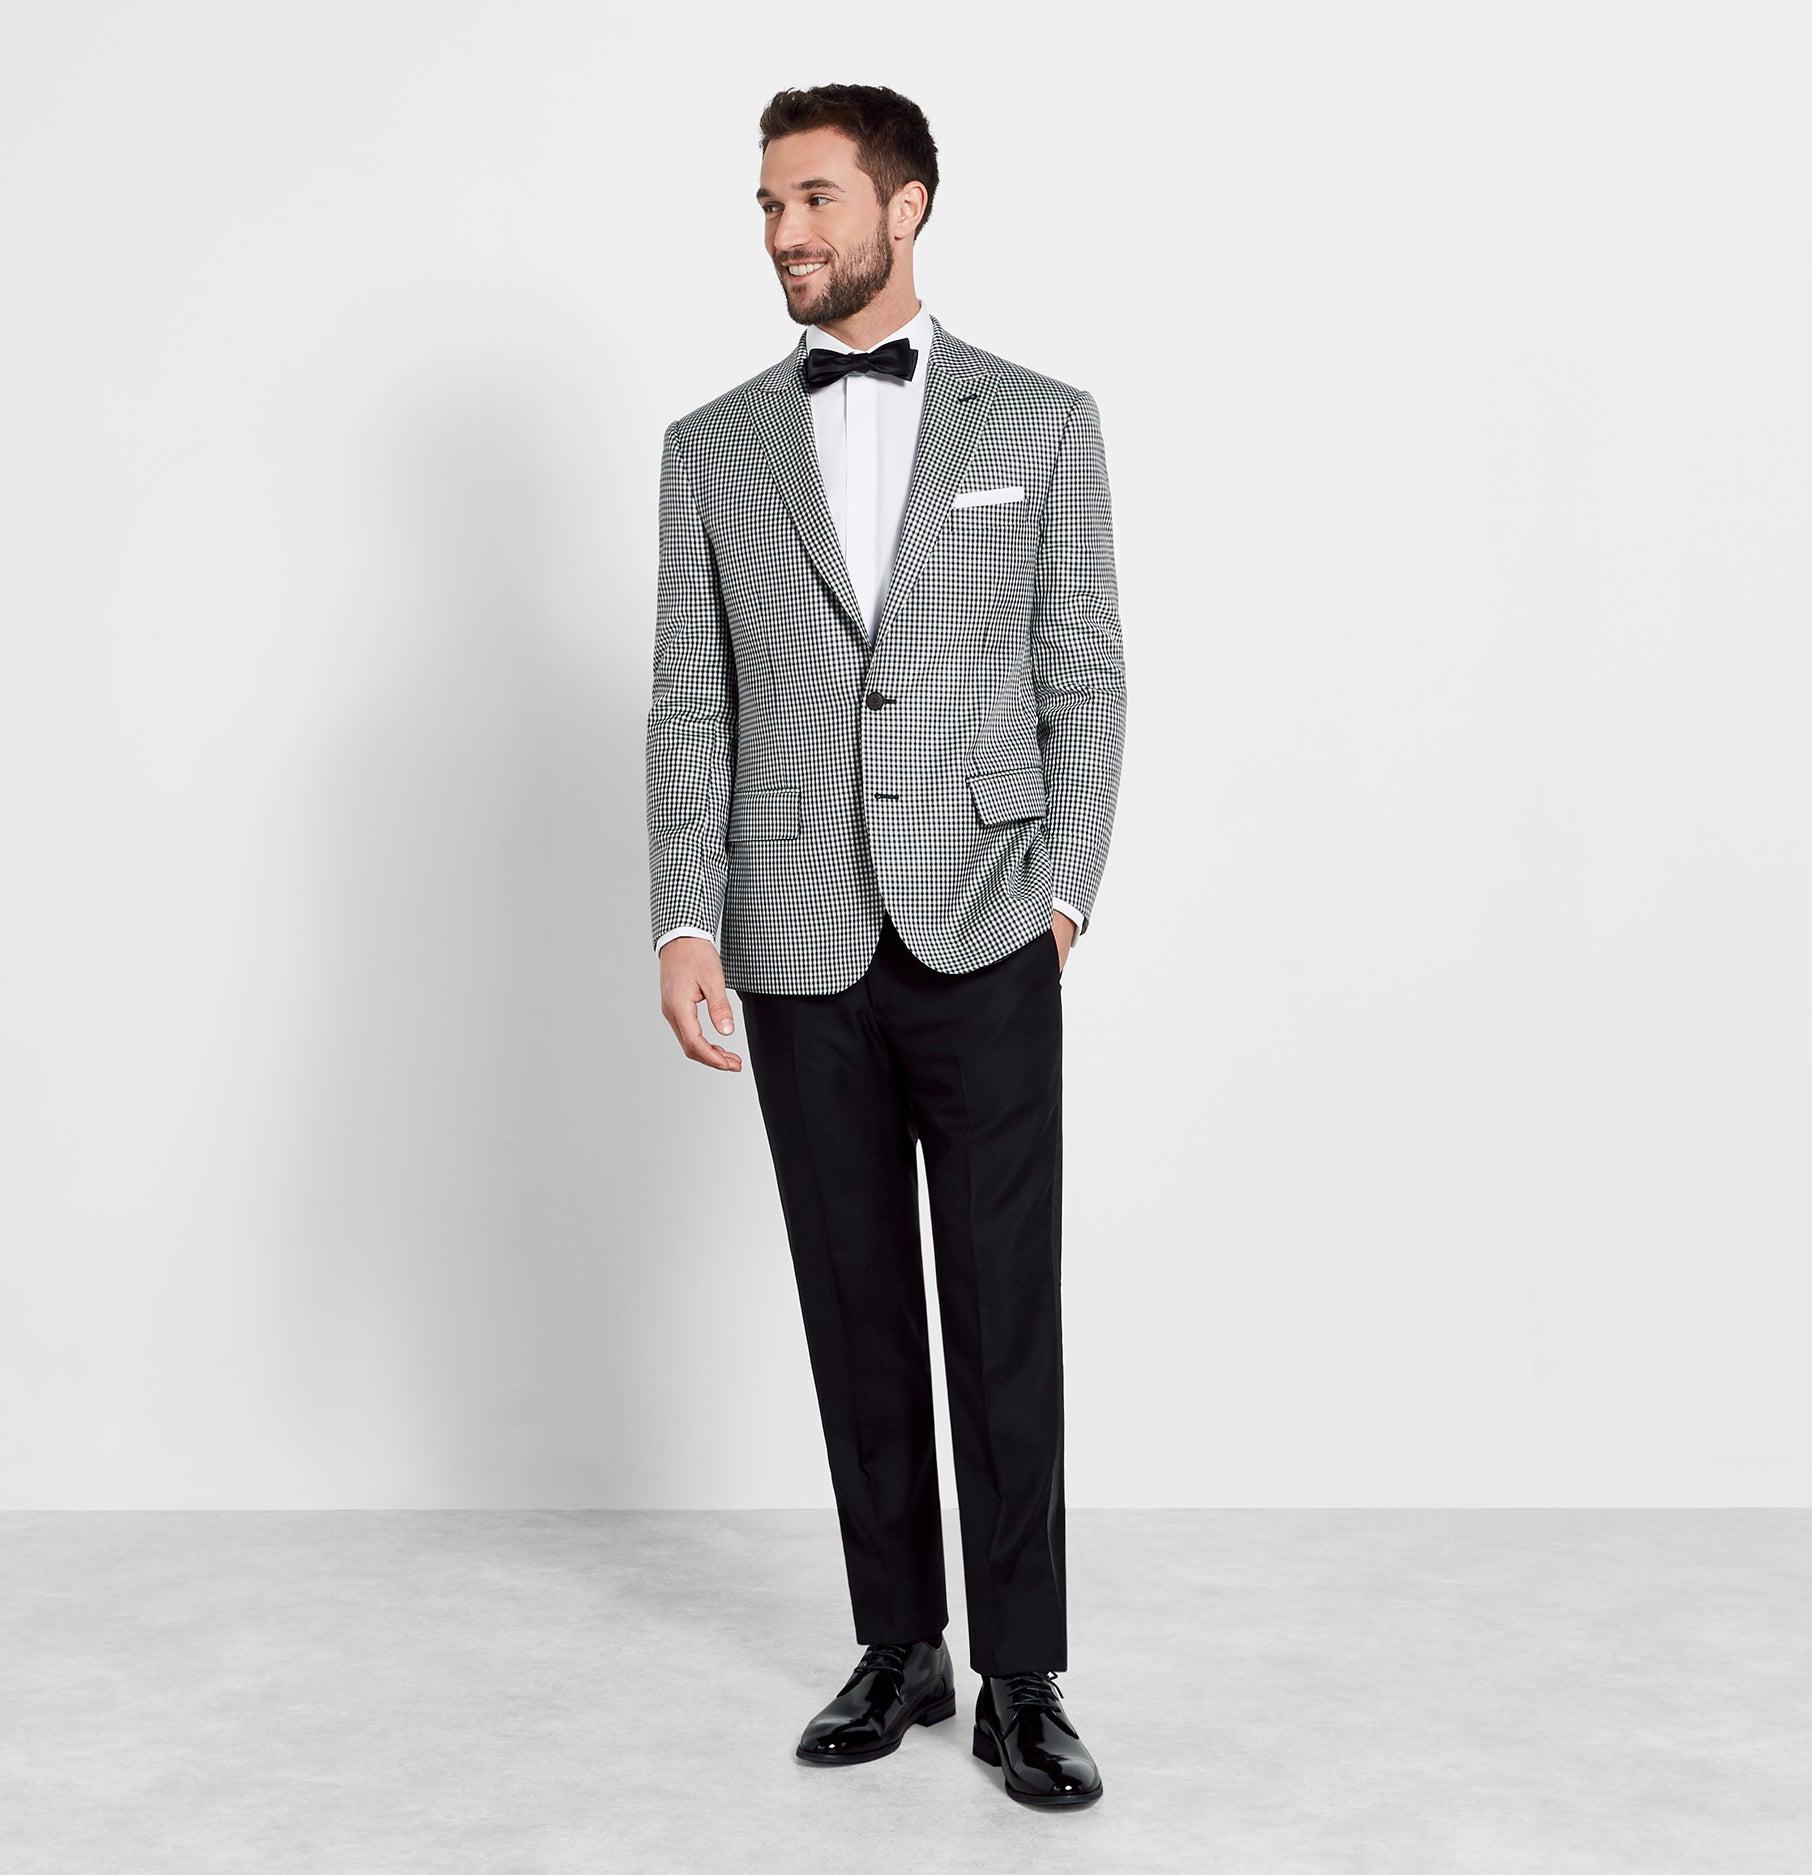 popular stores boy special sales Gingham Jacket Tuxedo